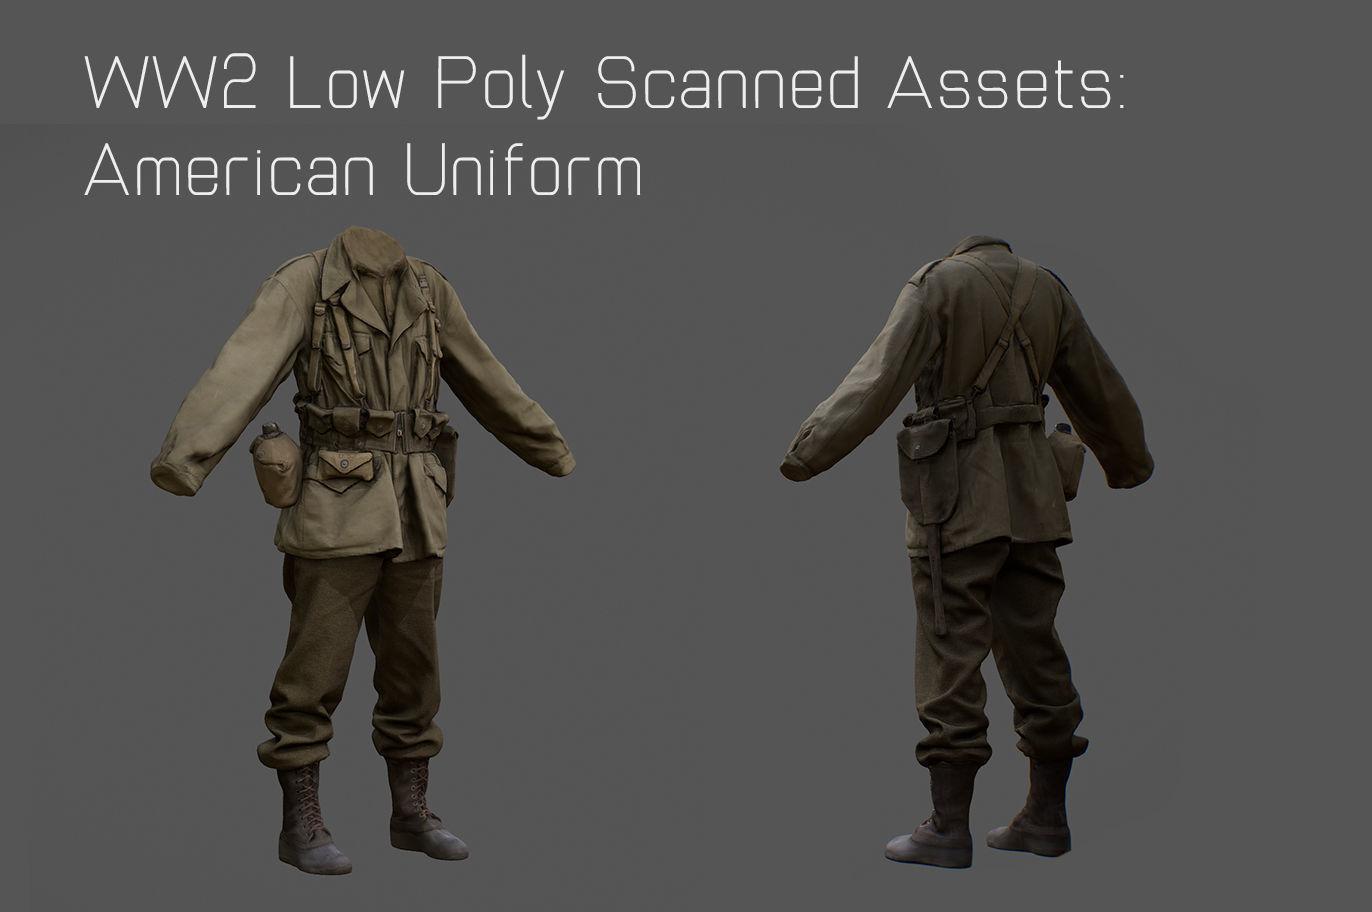 US American Uniform WW2 Photogrammetry Based 3D Scanned